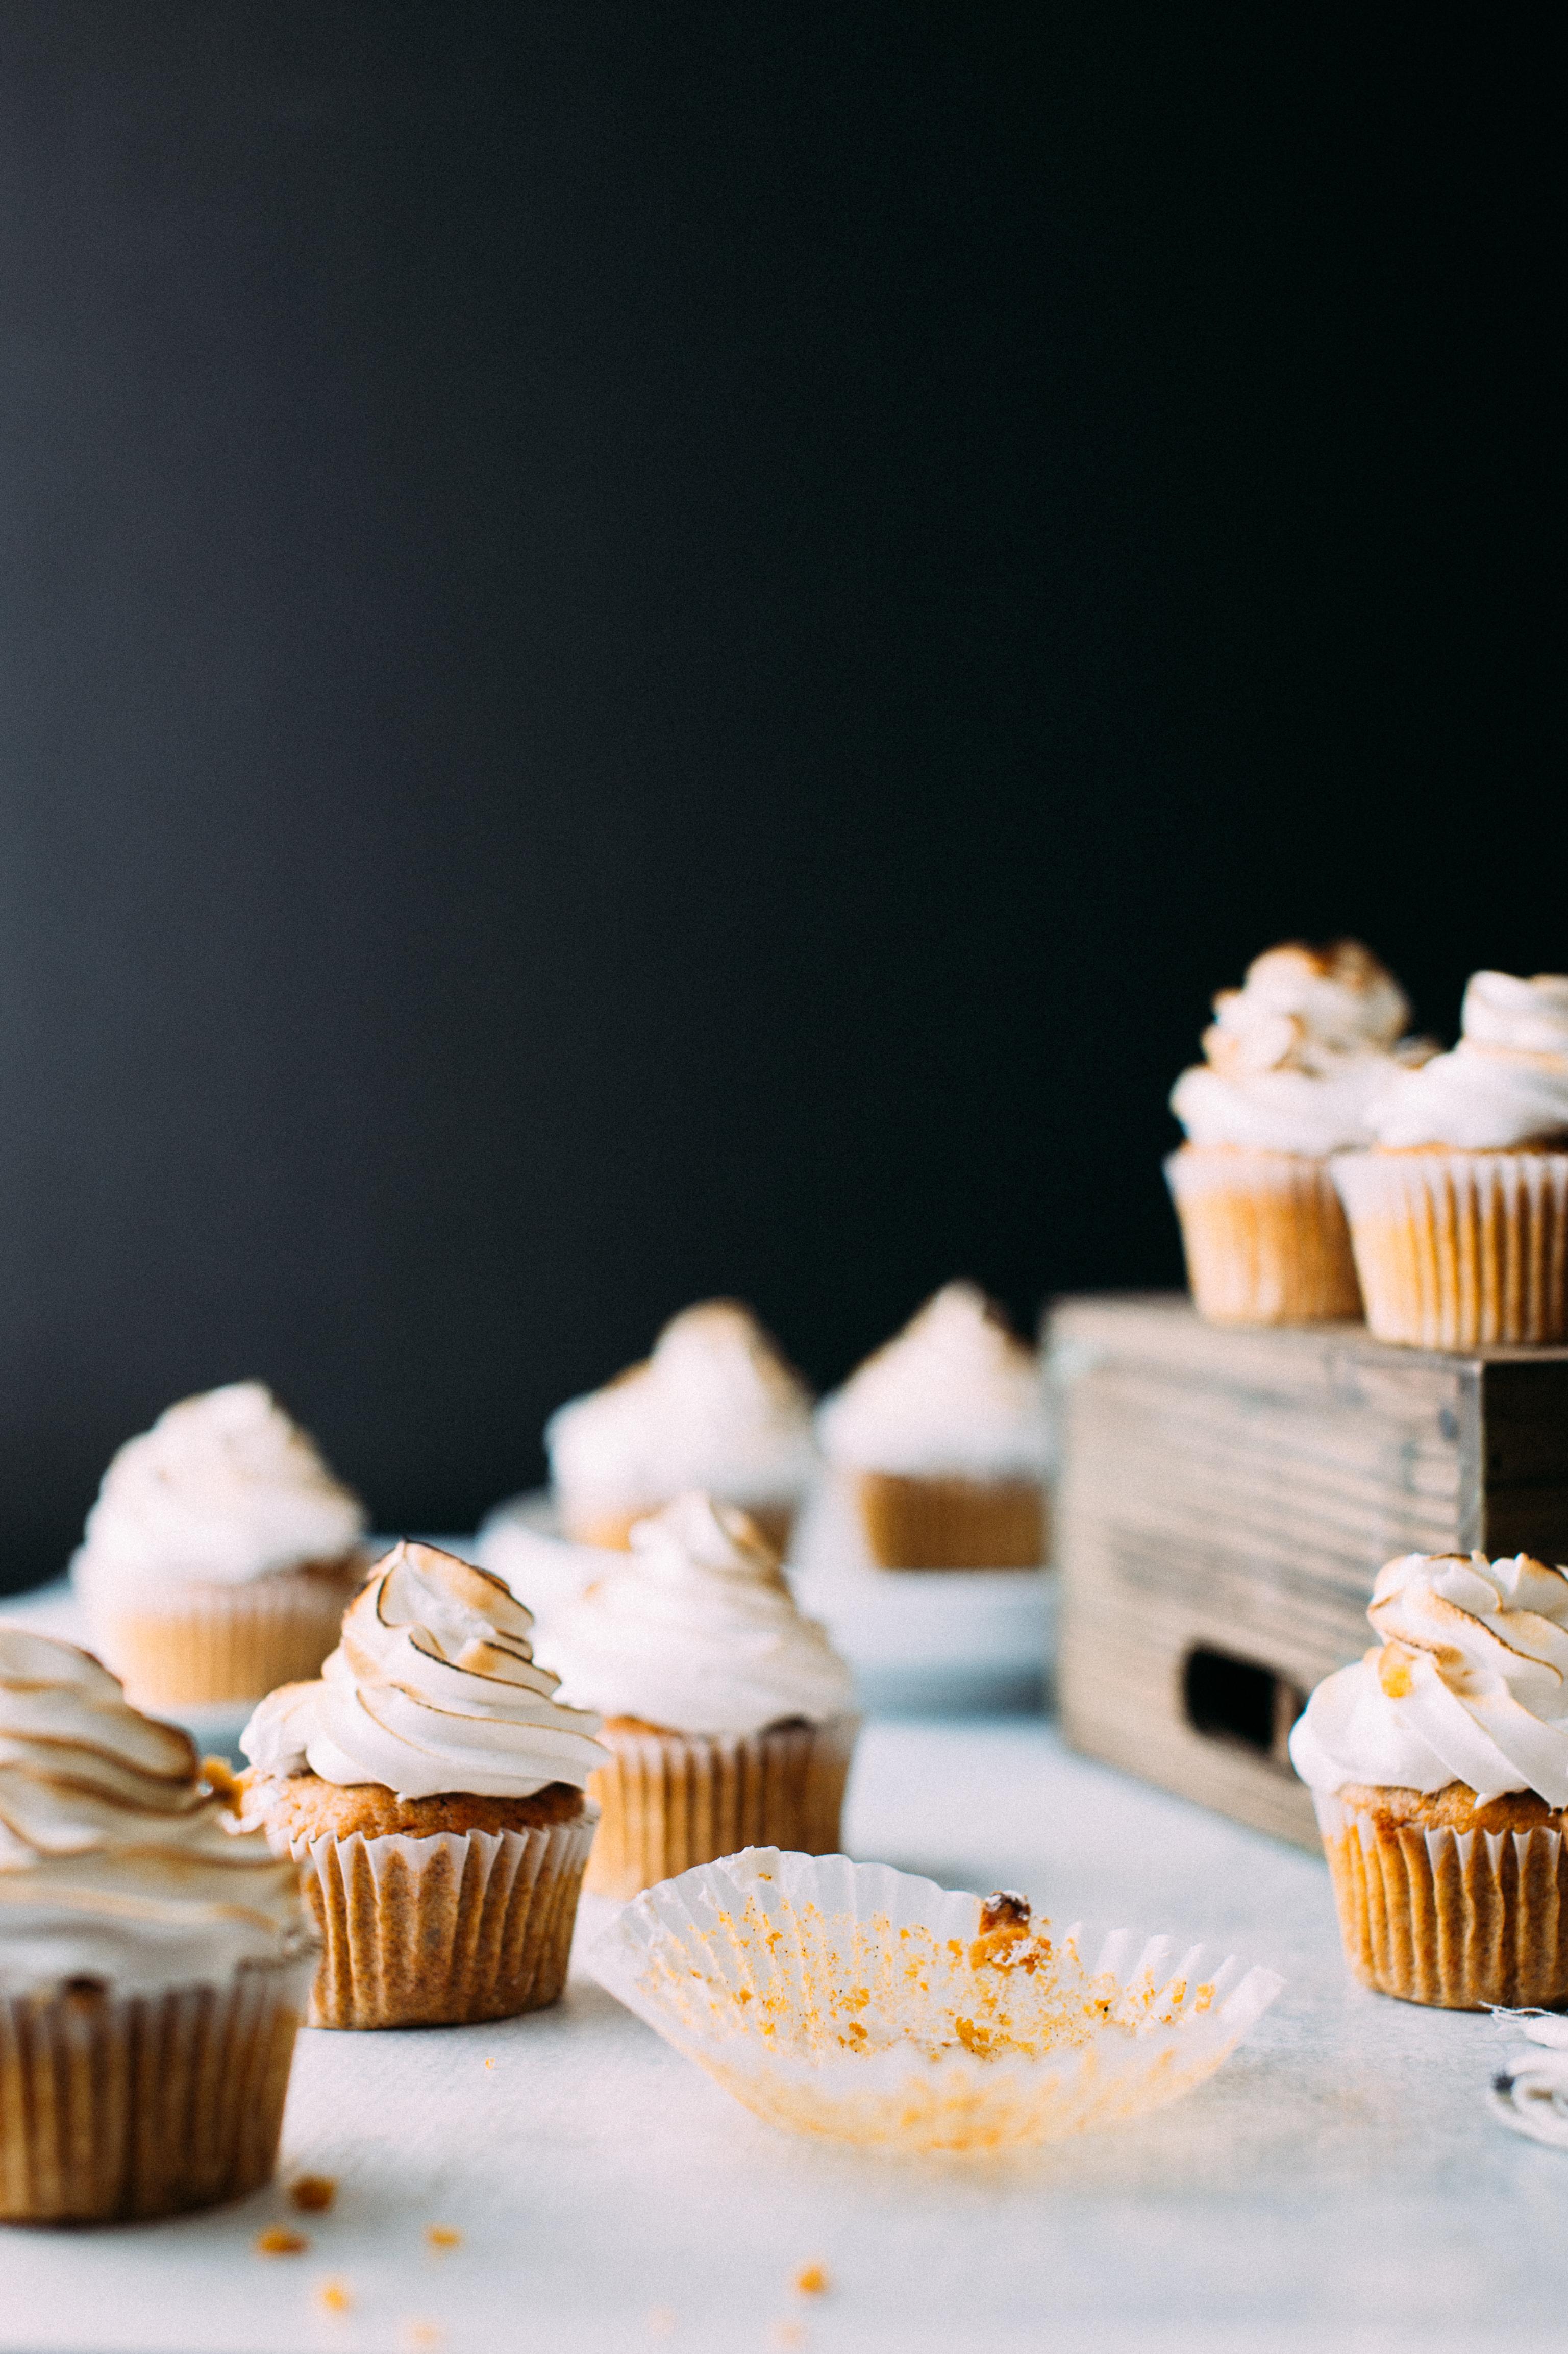 Cake Sweet Potato - memories of childhood